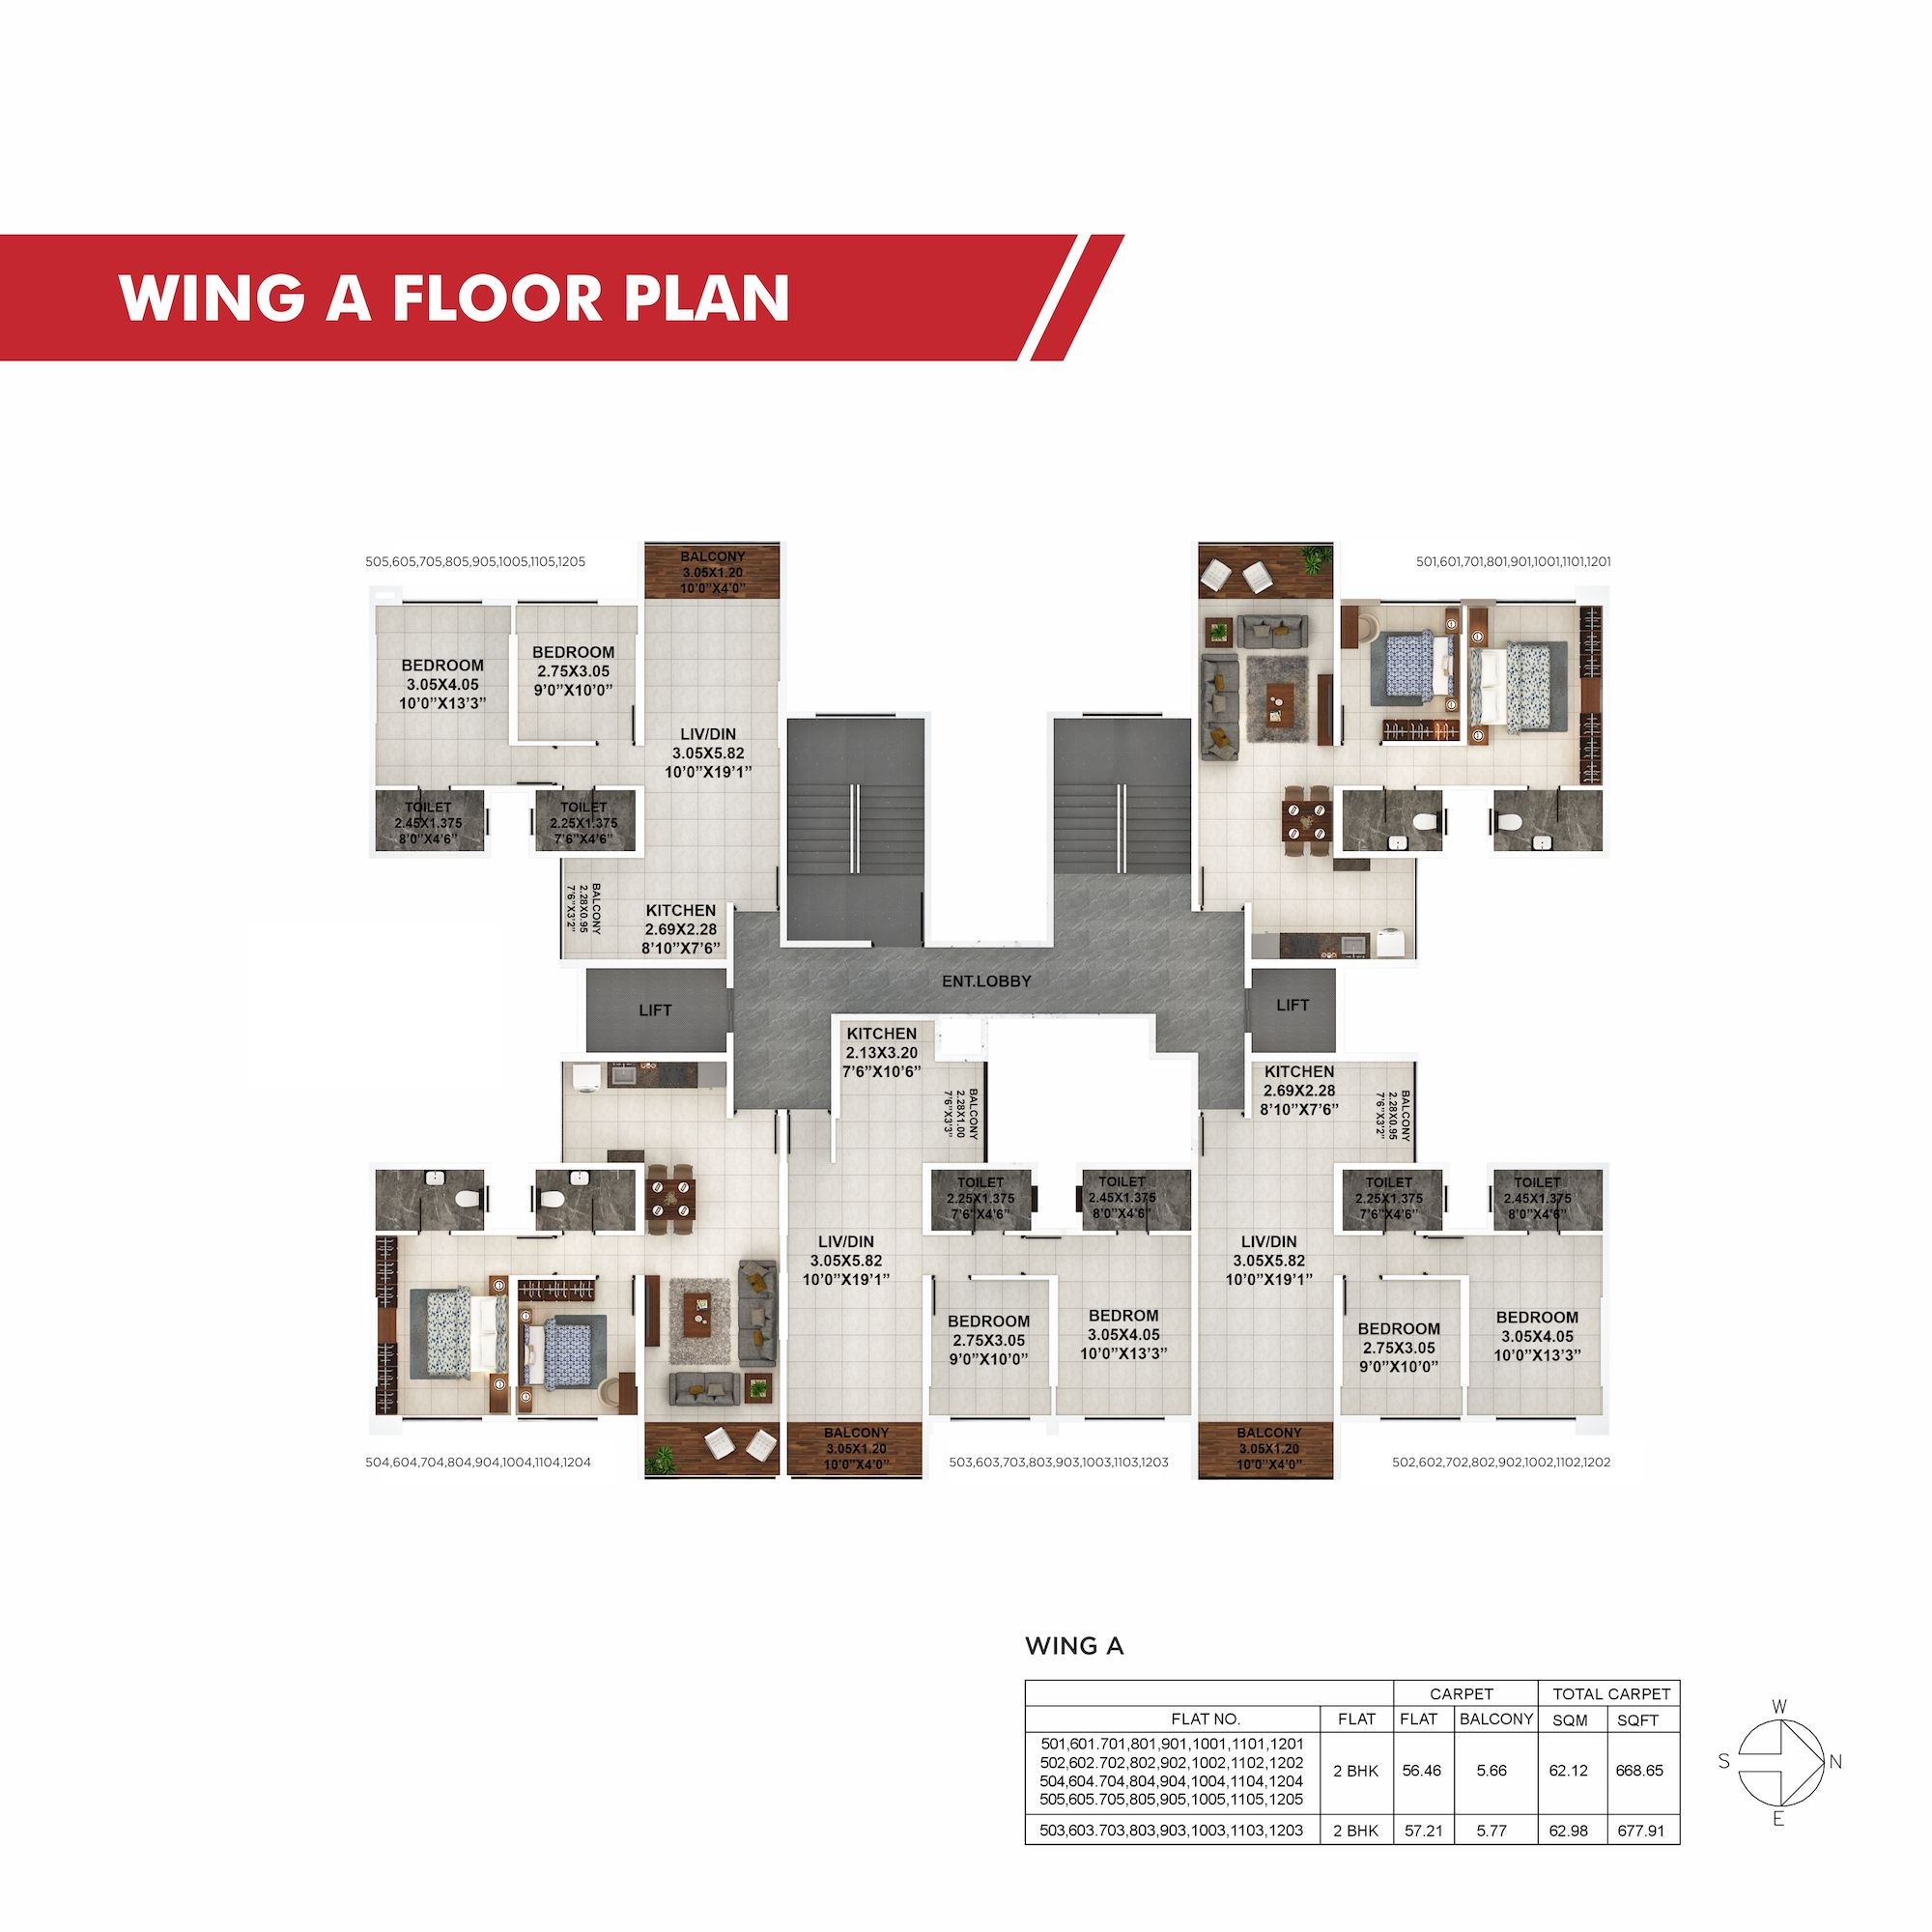 Palaash Wing A Floor Plan